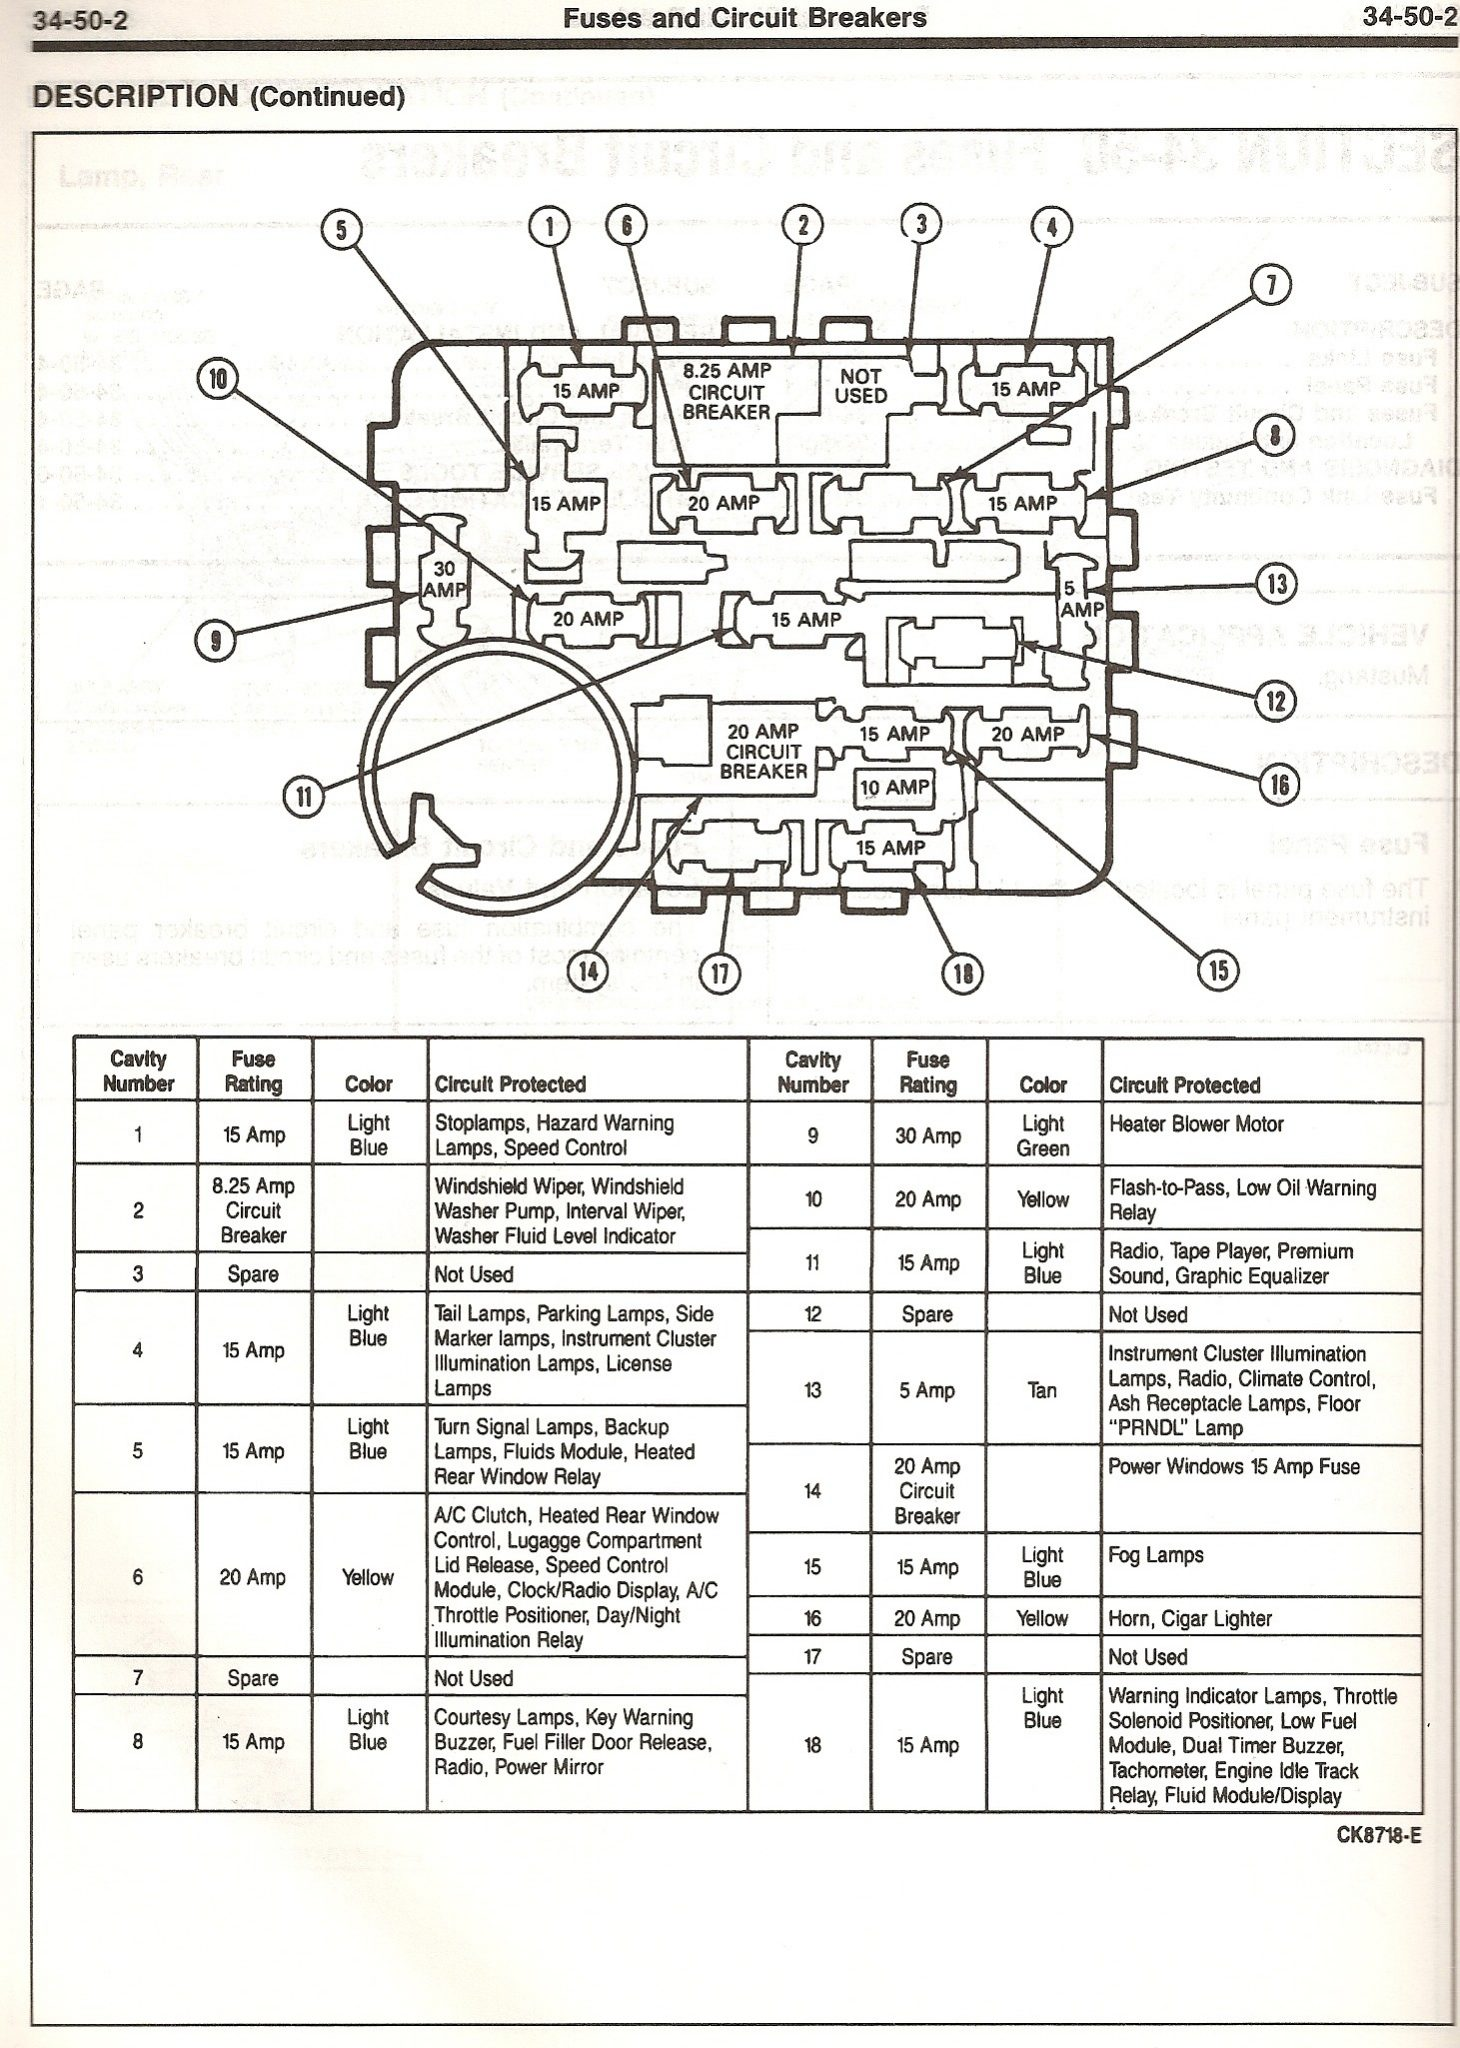 1992 ford bronco fuse box diagram - wiring diagram  wiring diagram - blogger